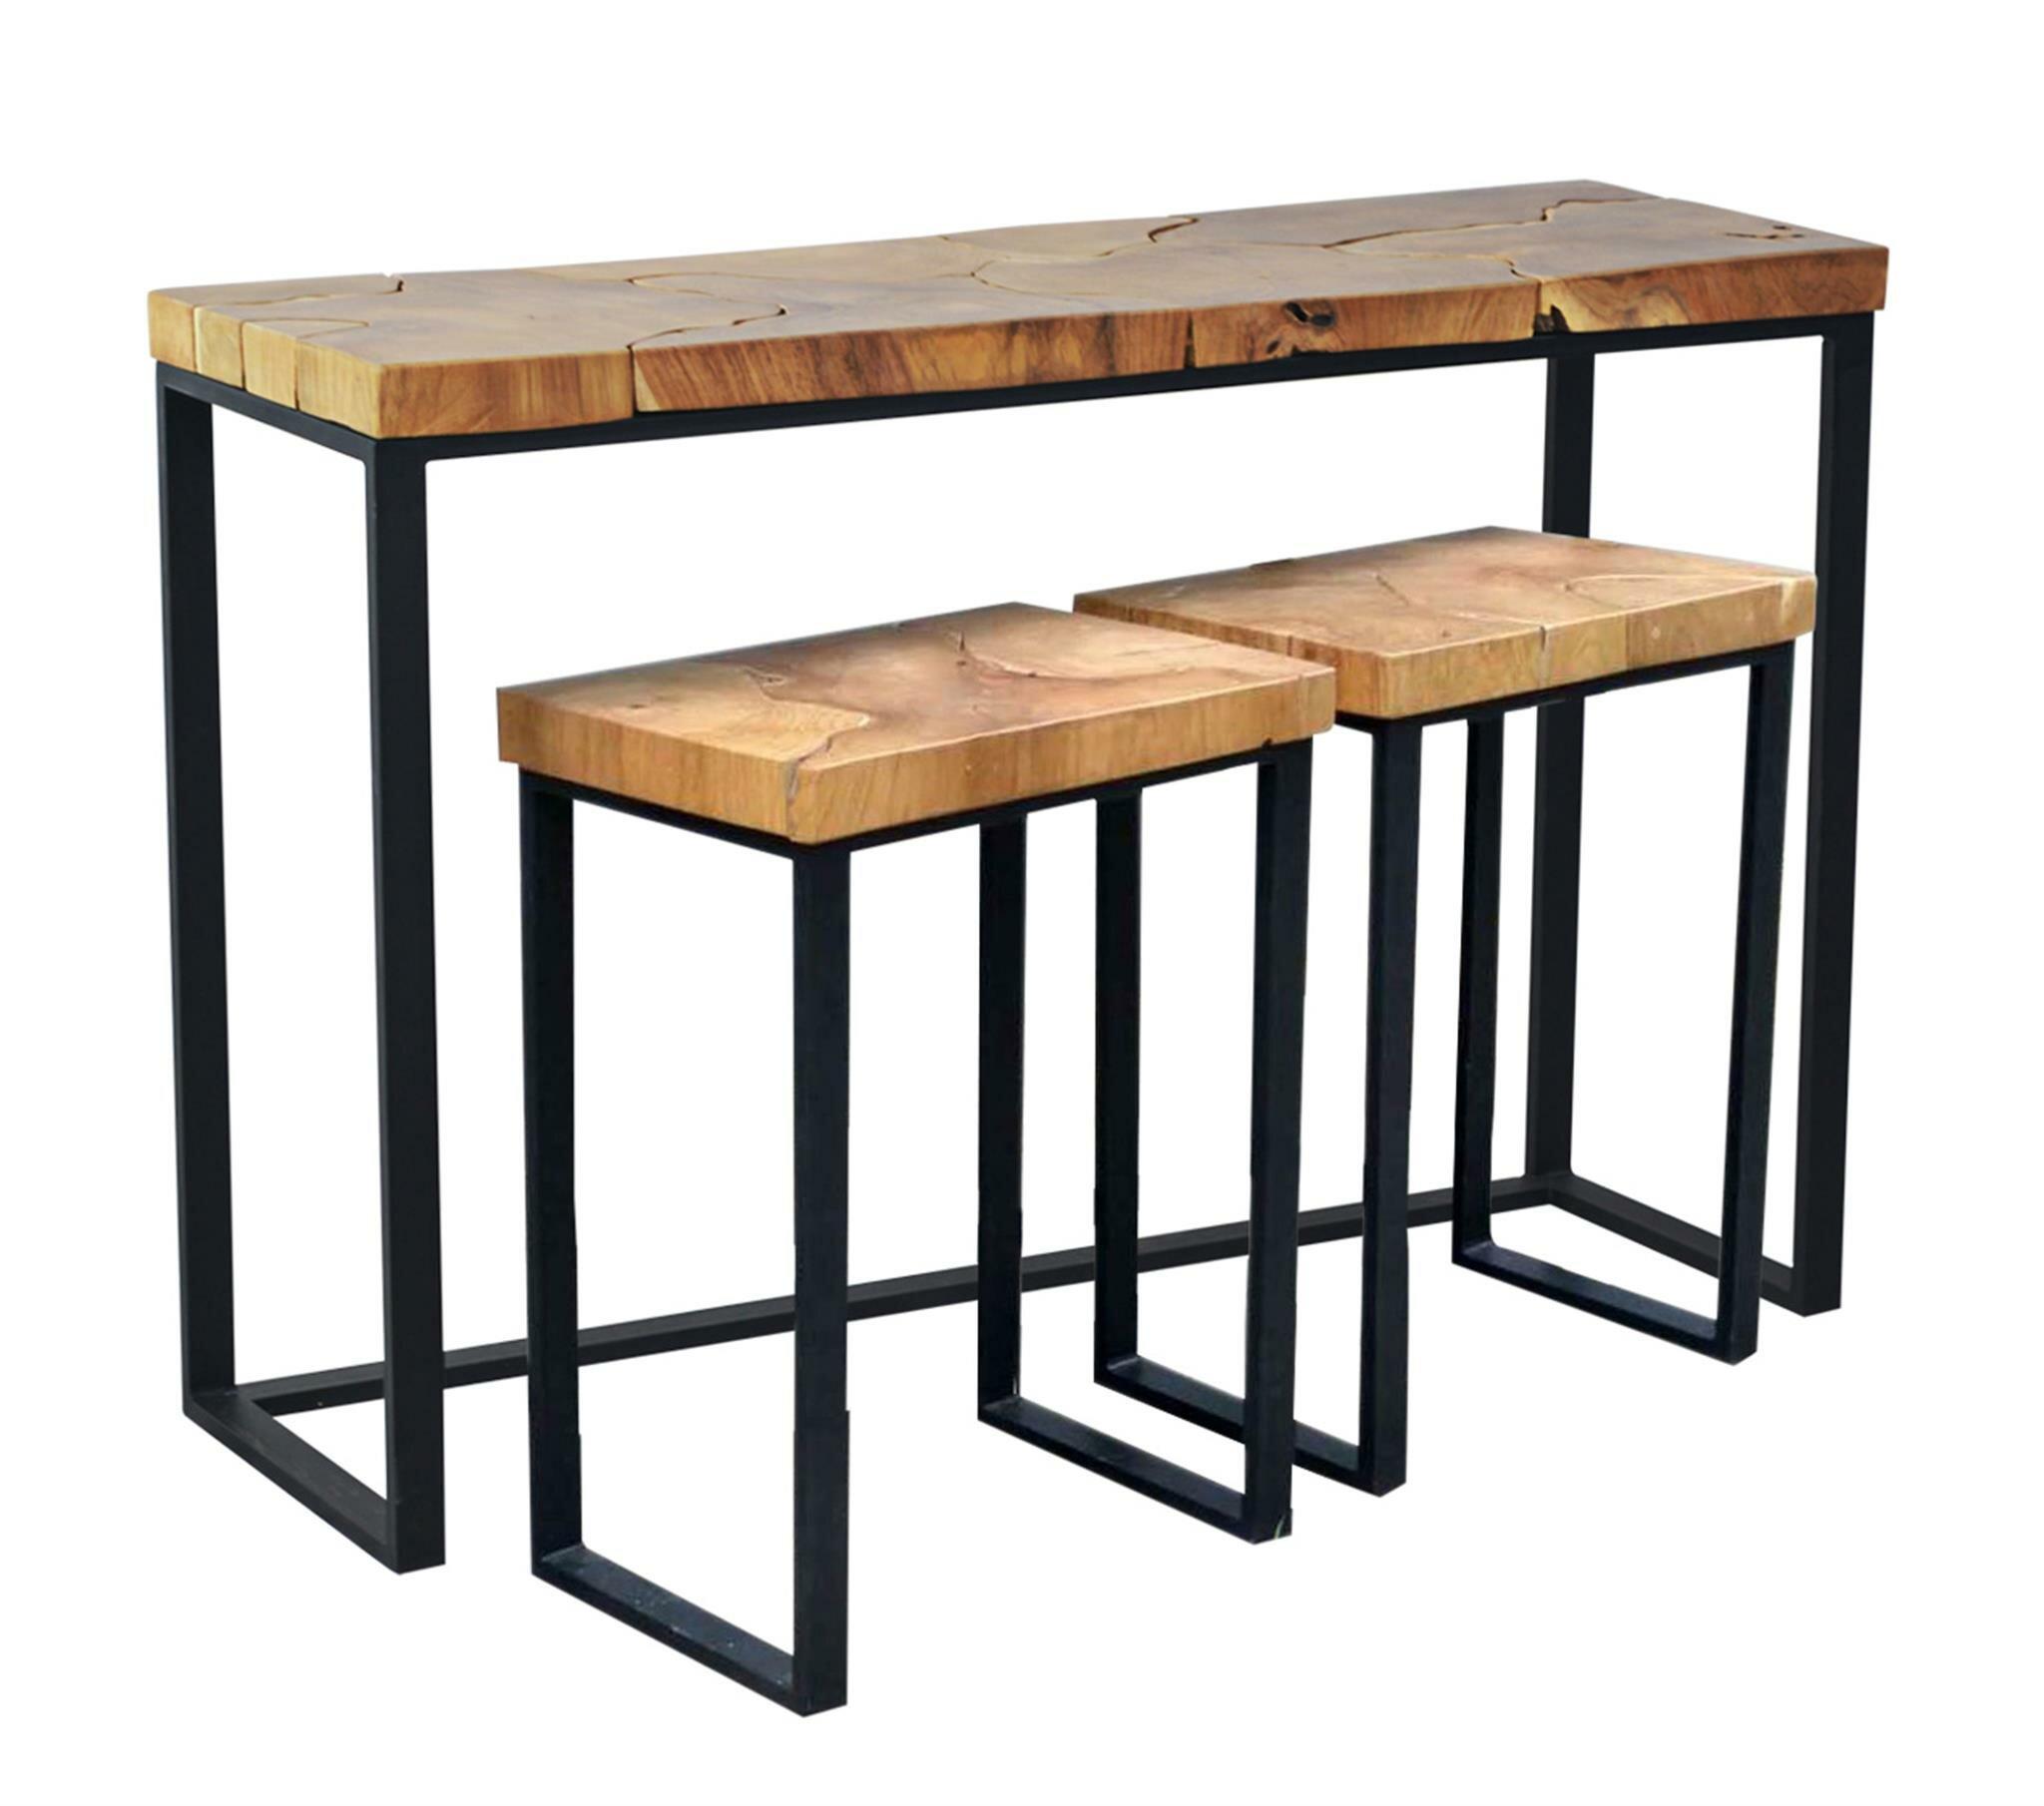 Brayden Studio Hoekstra Console Table and Stool Set | Wayfair